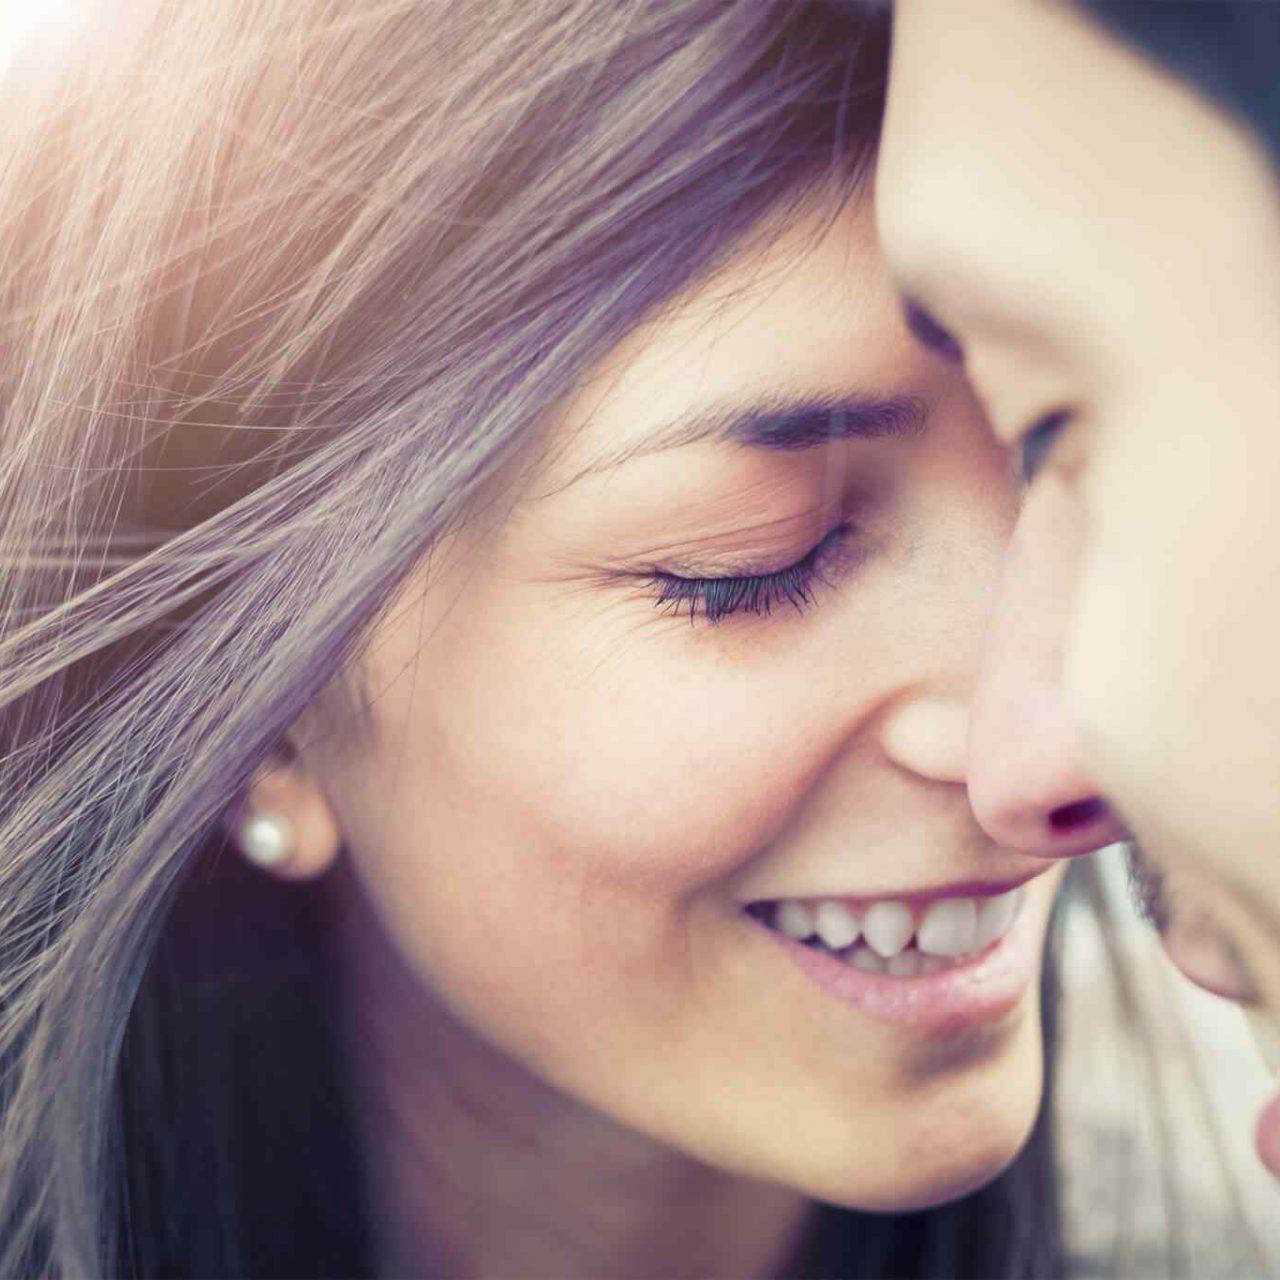 https://talatiandtalati.com/wp-content/uploads/2018/01/img-class-marriage-01-1280x1280.jpg